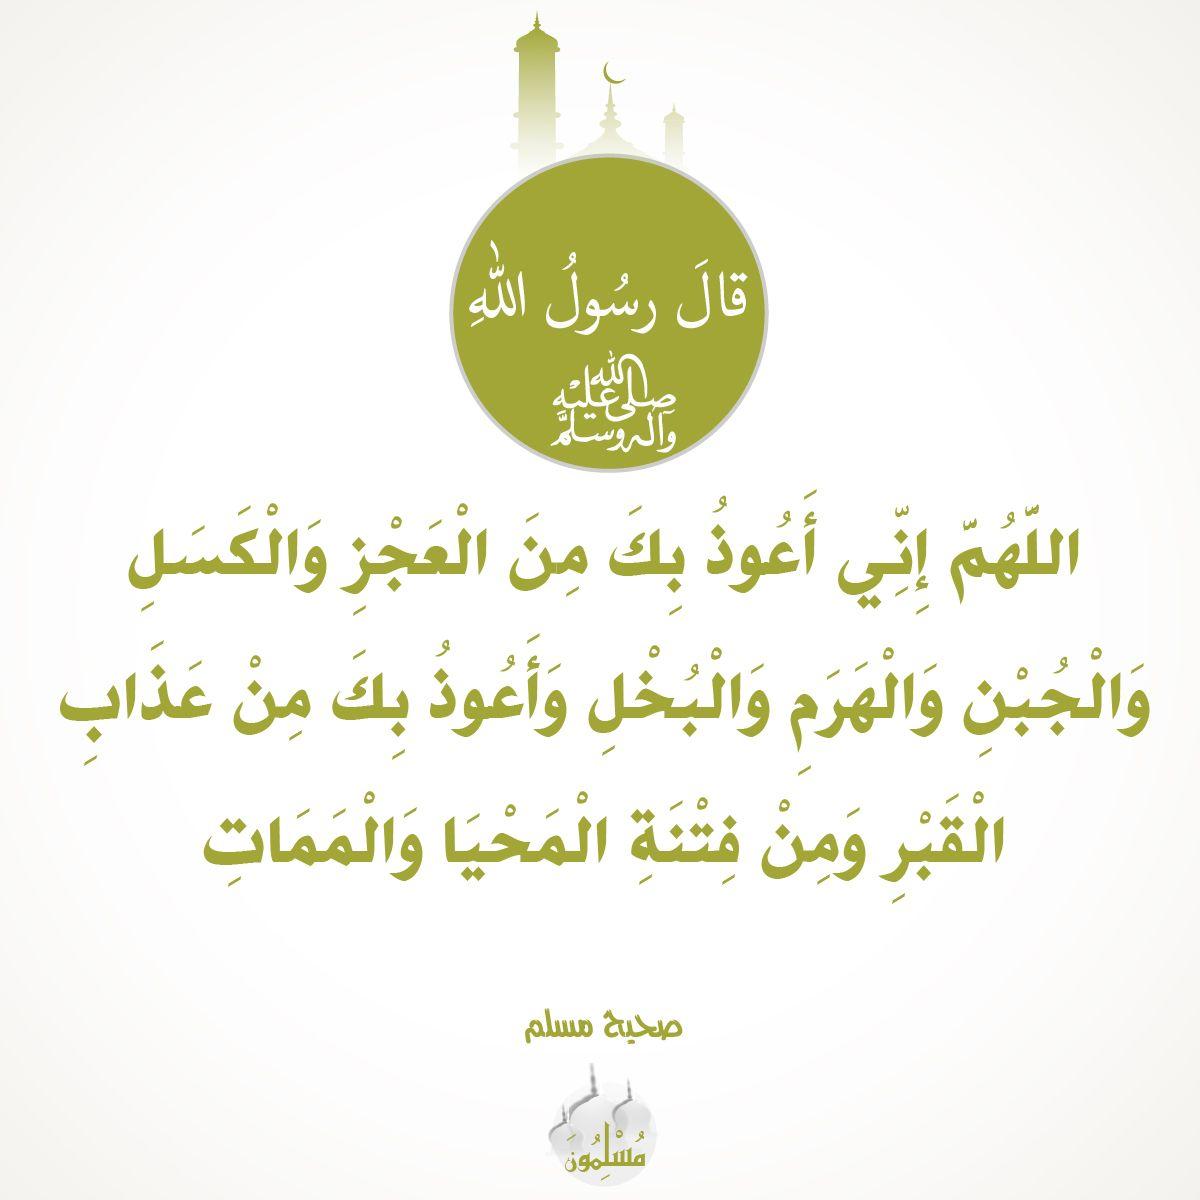 Pin By مسلمون On اسلام Islam Islam Arabic Calligraphy